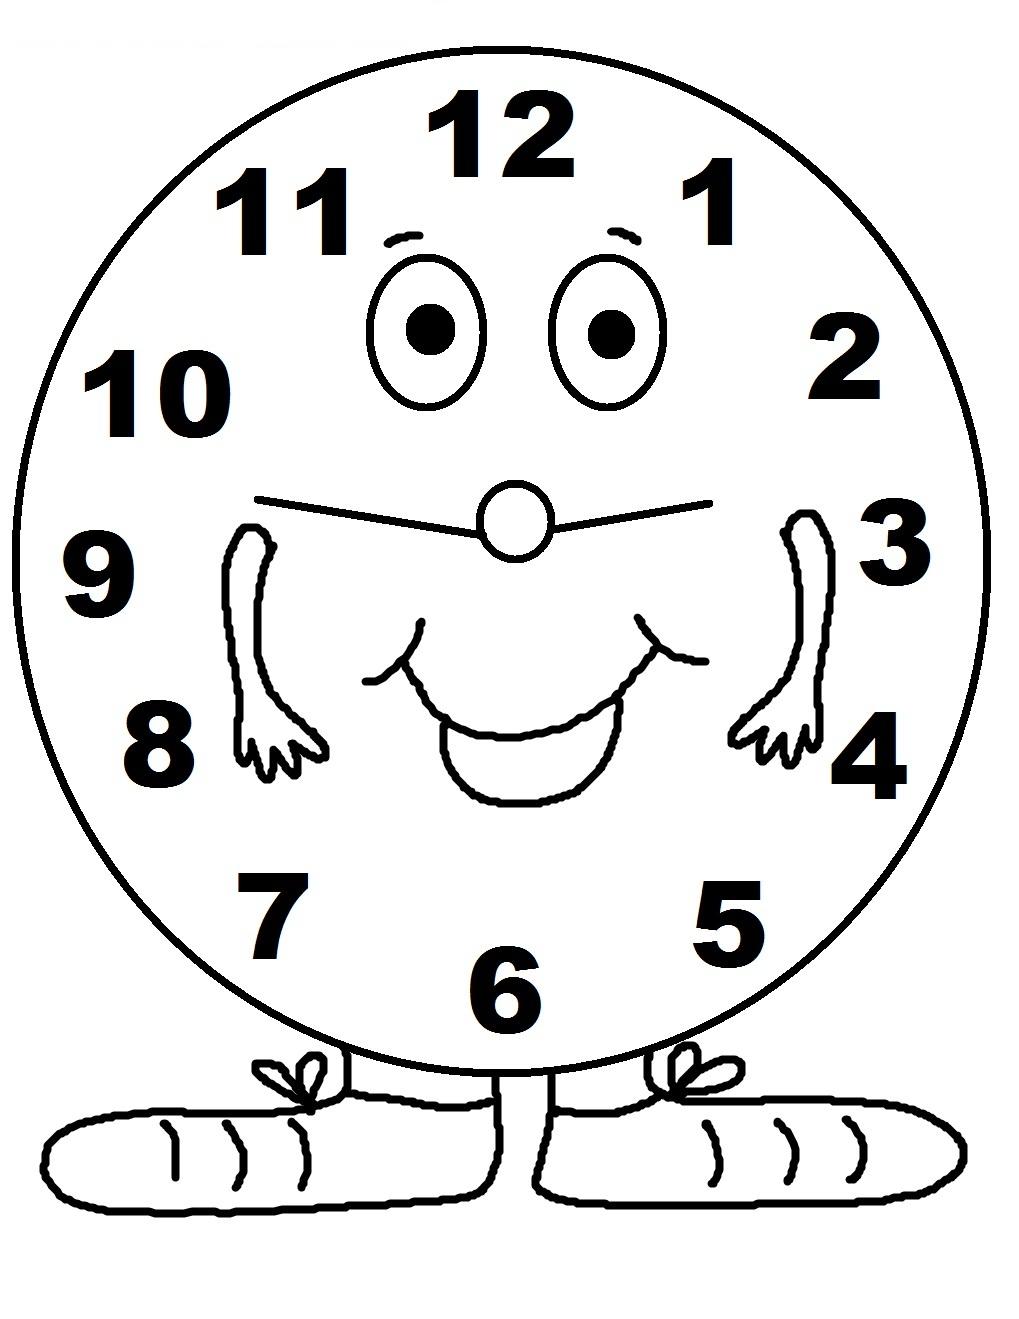 Decorative Clock Coloring Page